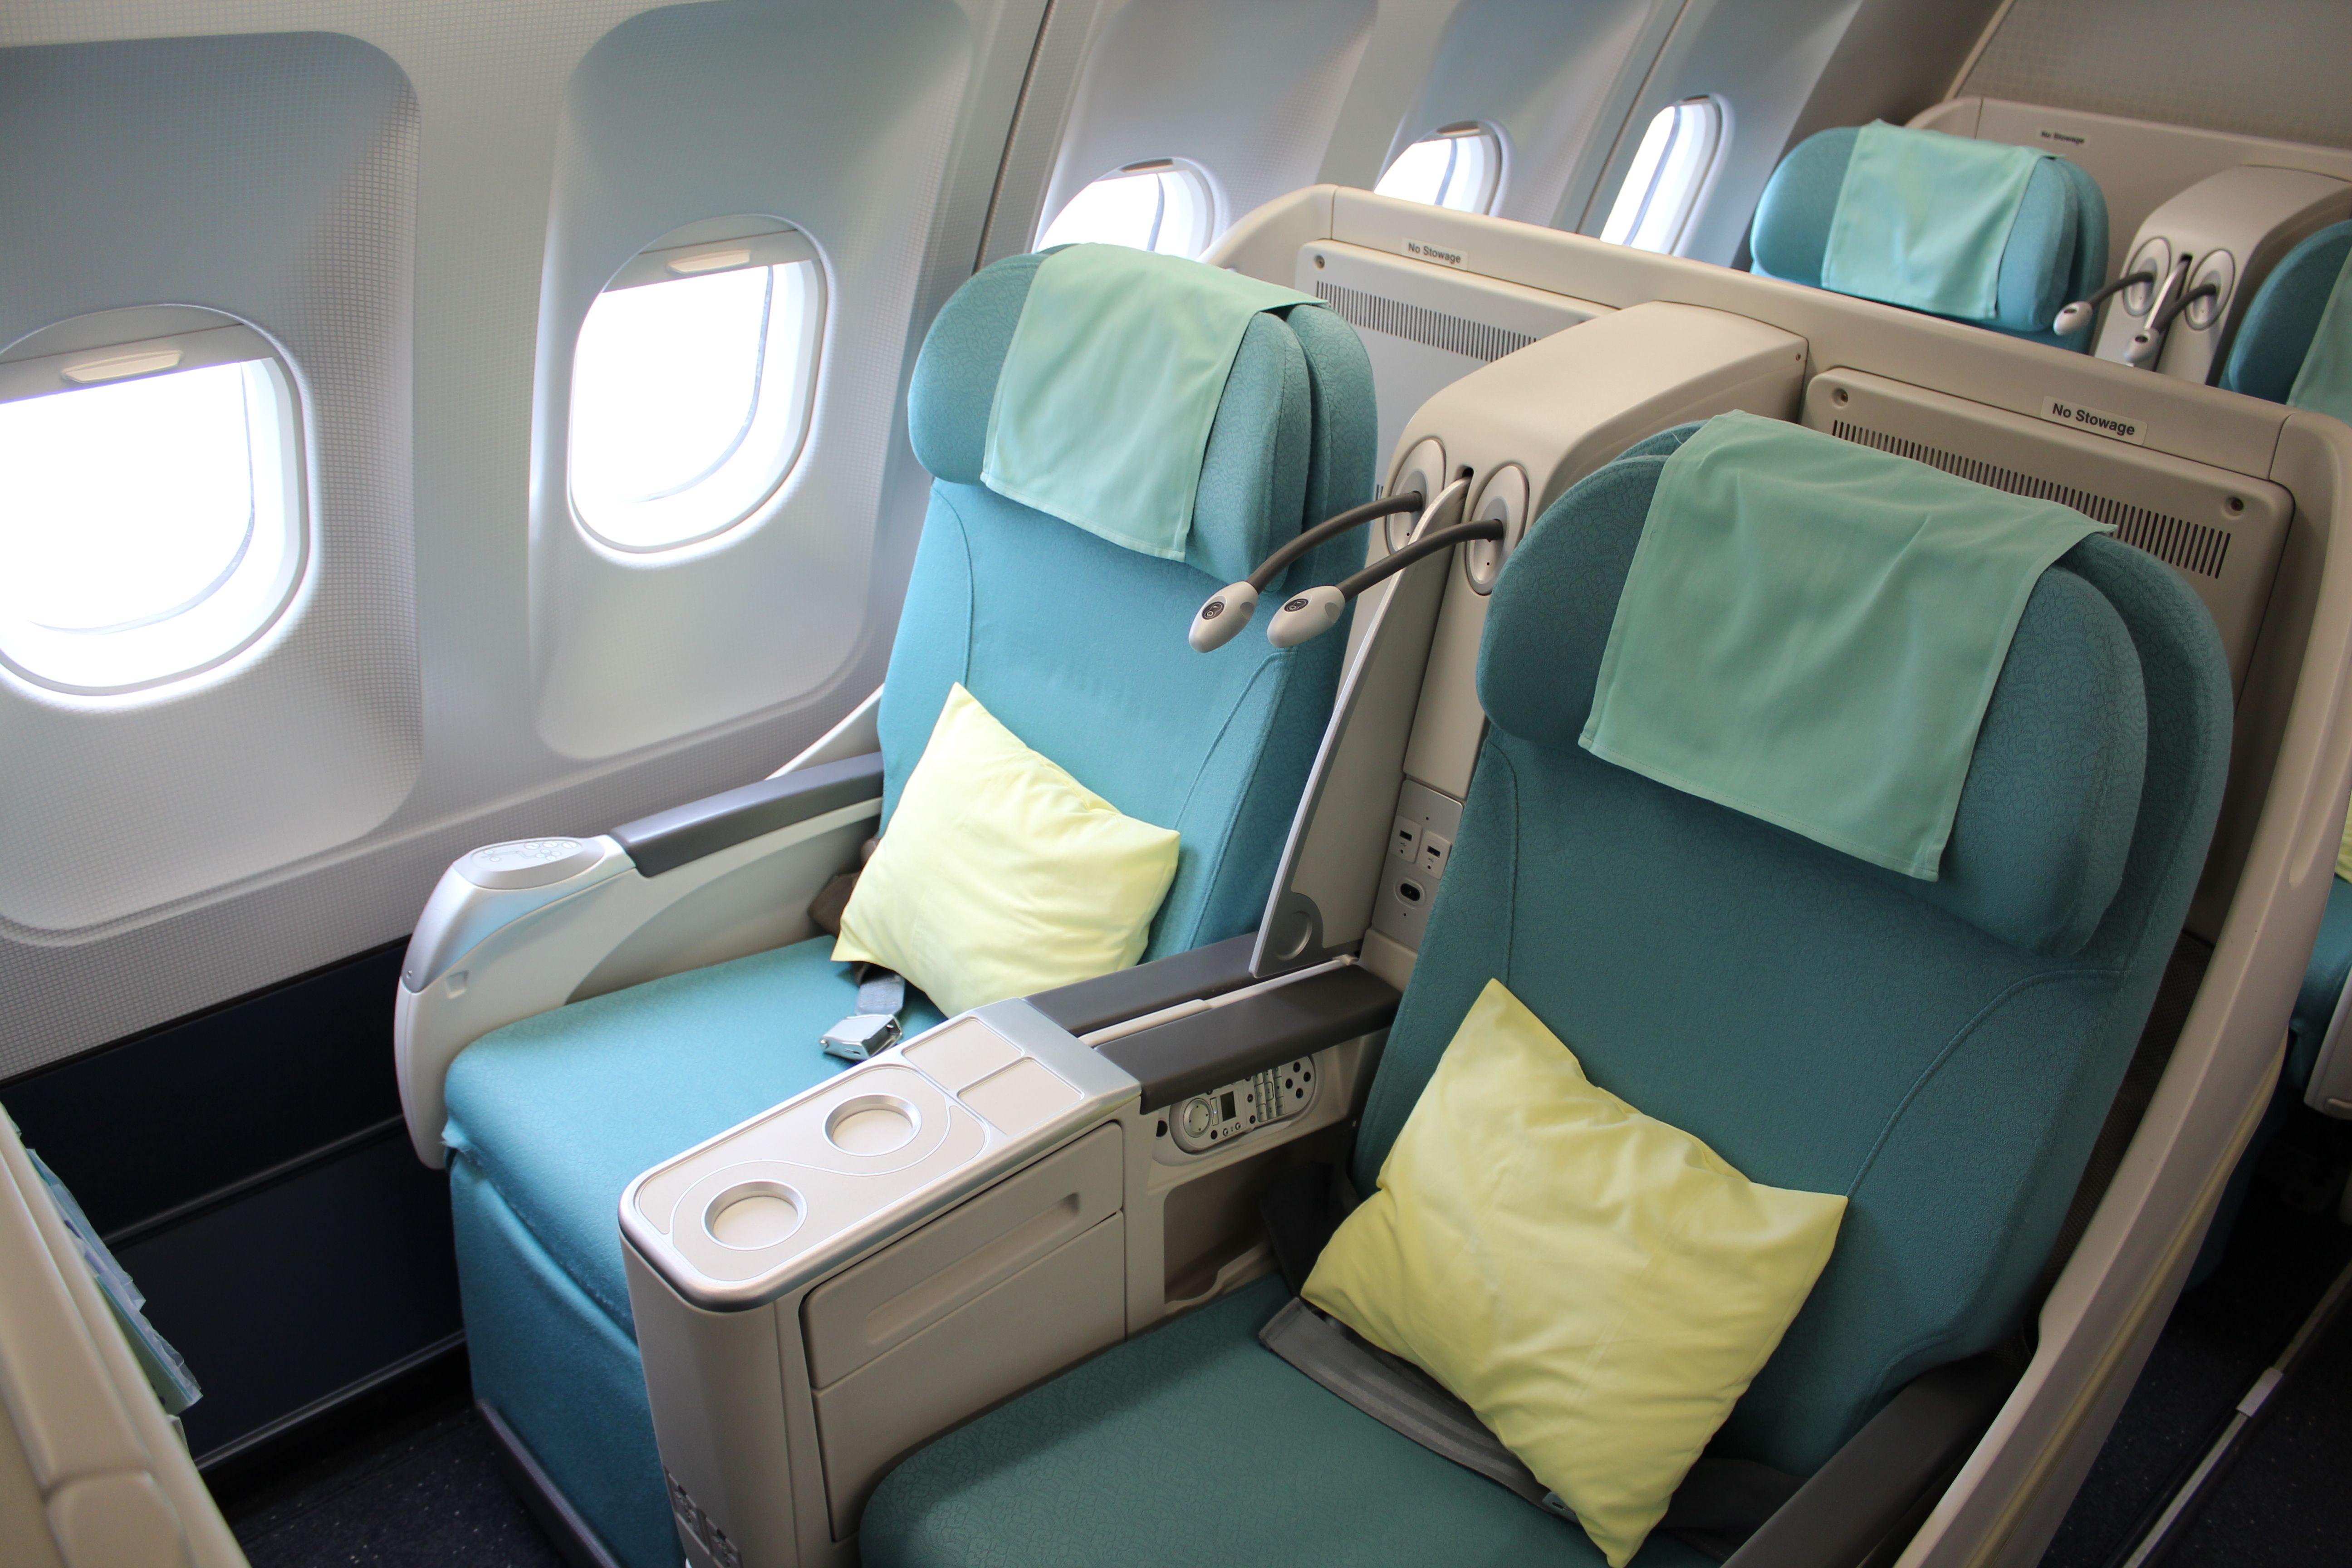 Korean Air A330200 Business Class Sleeper Seat Airlines